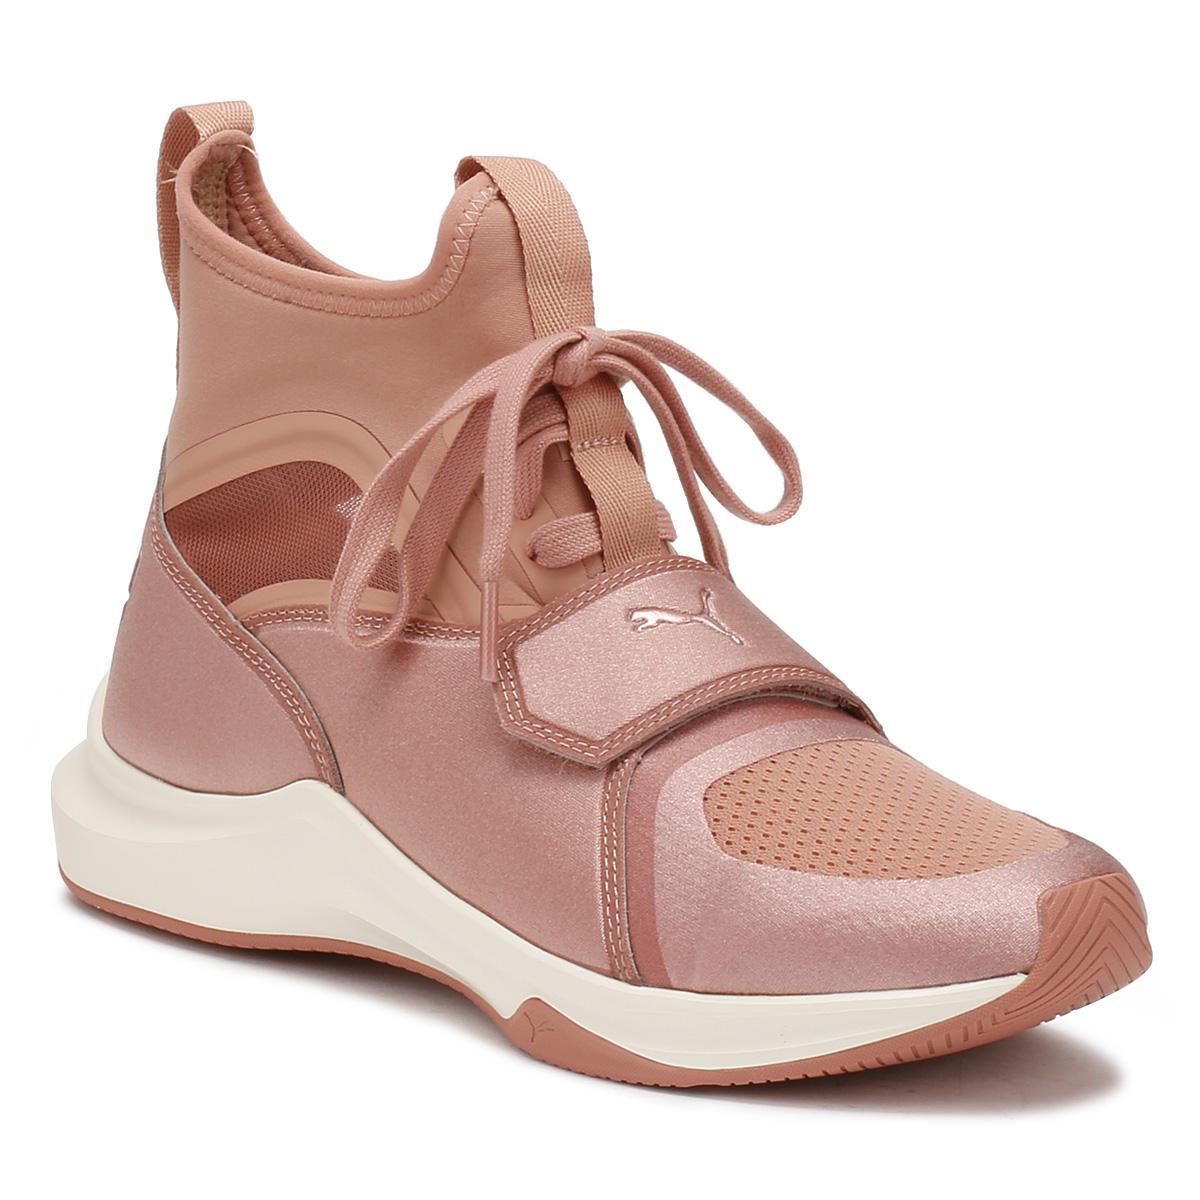 2801779db79d0c Lyst - PUMA Womens Selena Gomez Pink Phenom Trainers in Pink - Save 6%